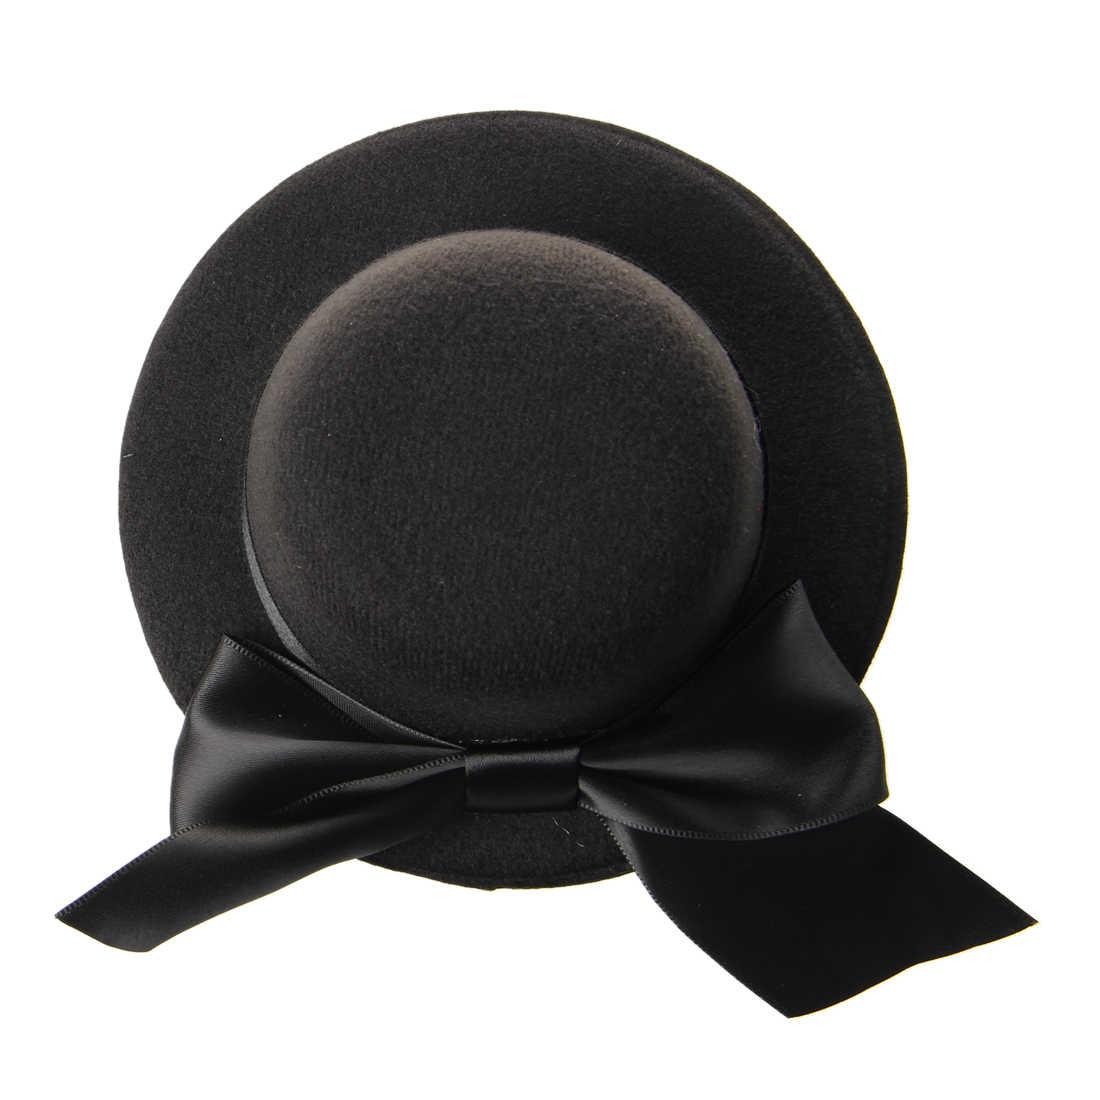 8359f3dc7 Ladies Mini Top Hat Fascinator Burlesque Millinery w/ Bowknot - Black